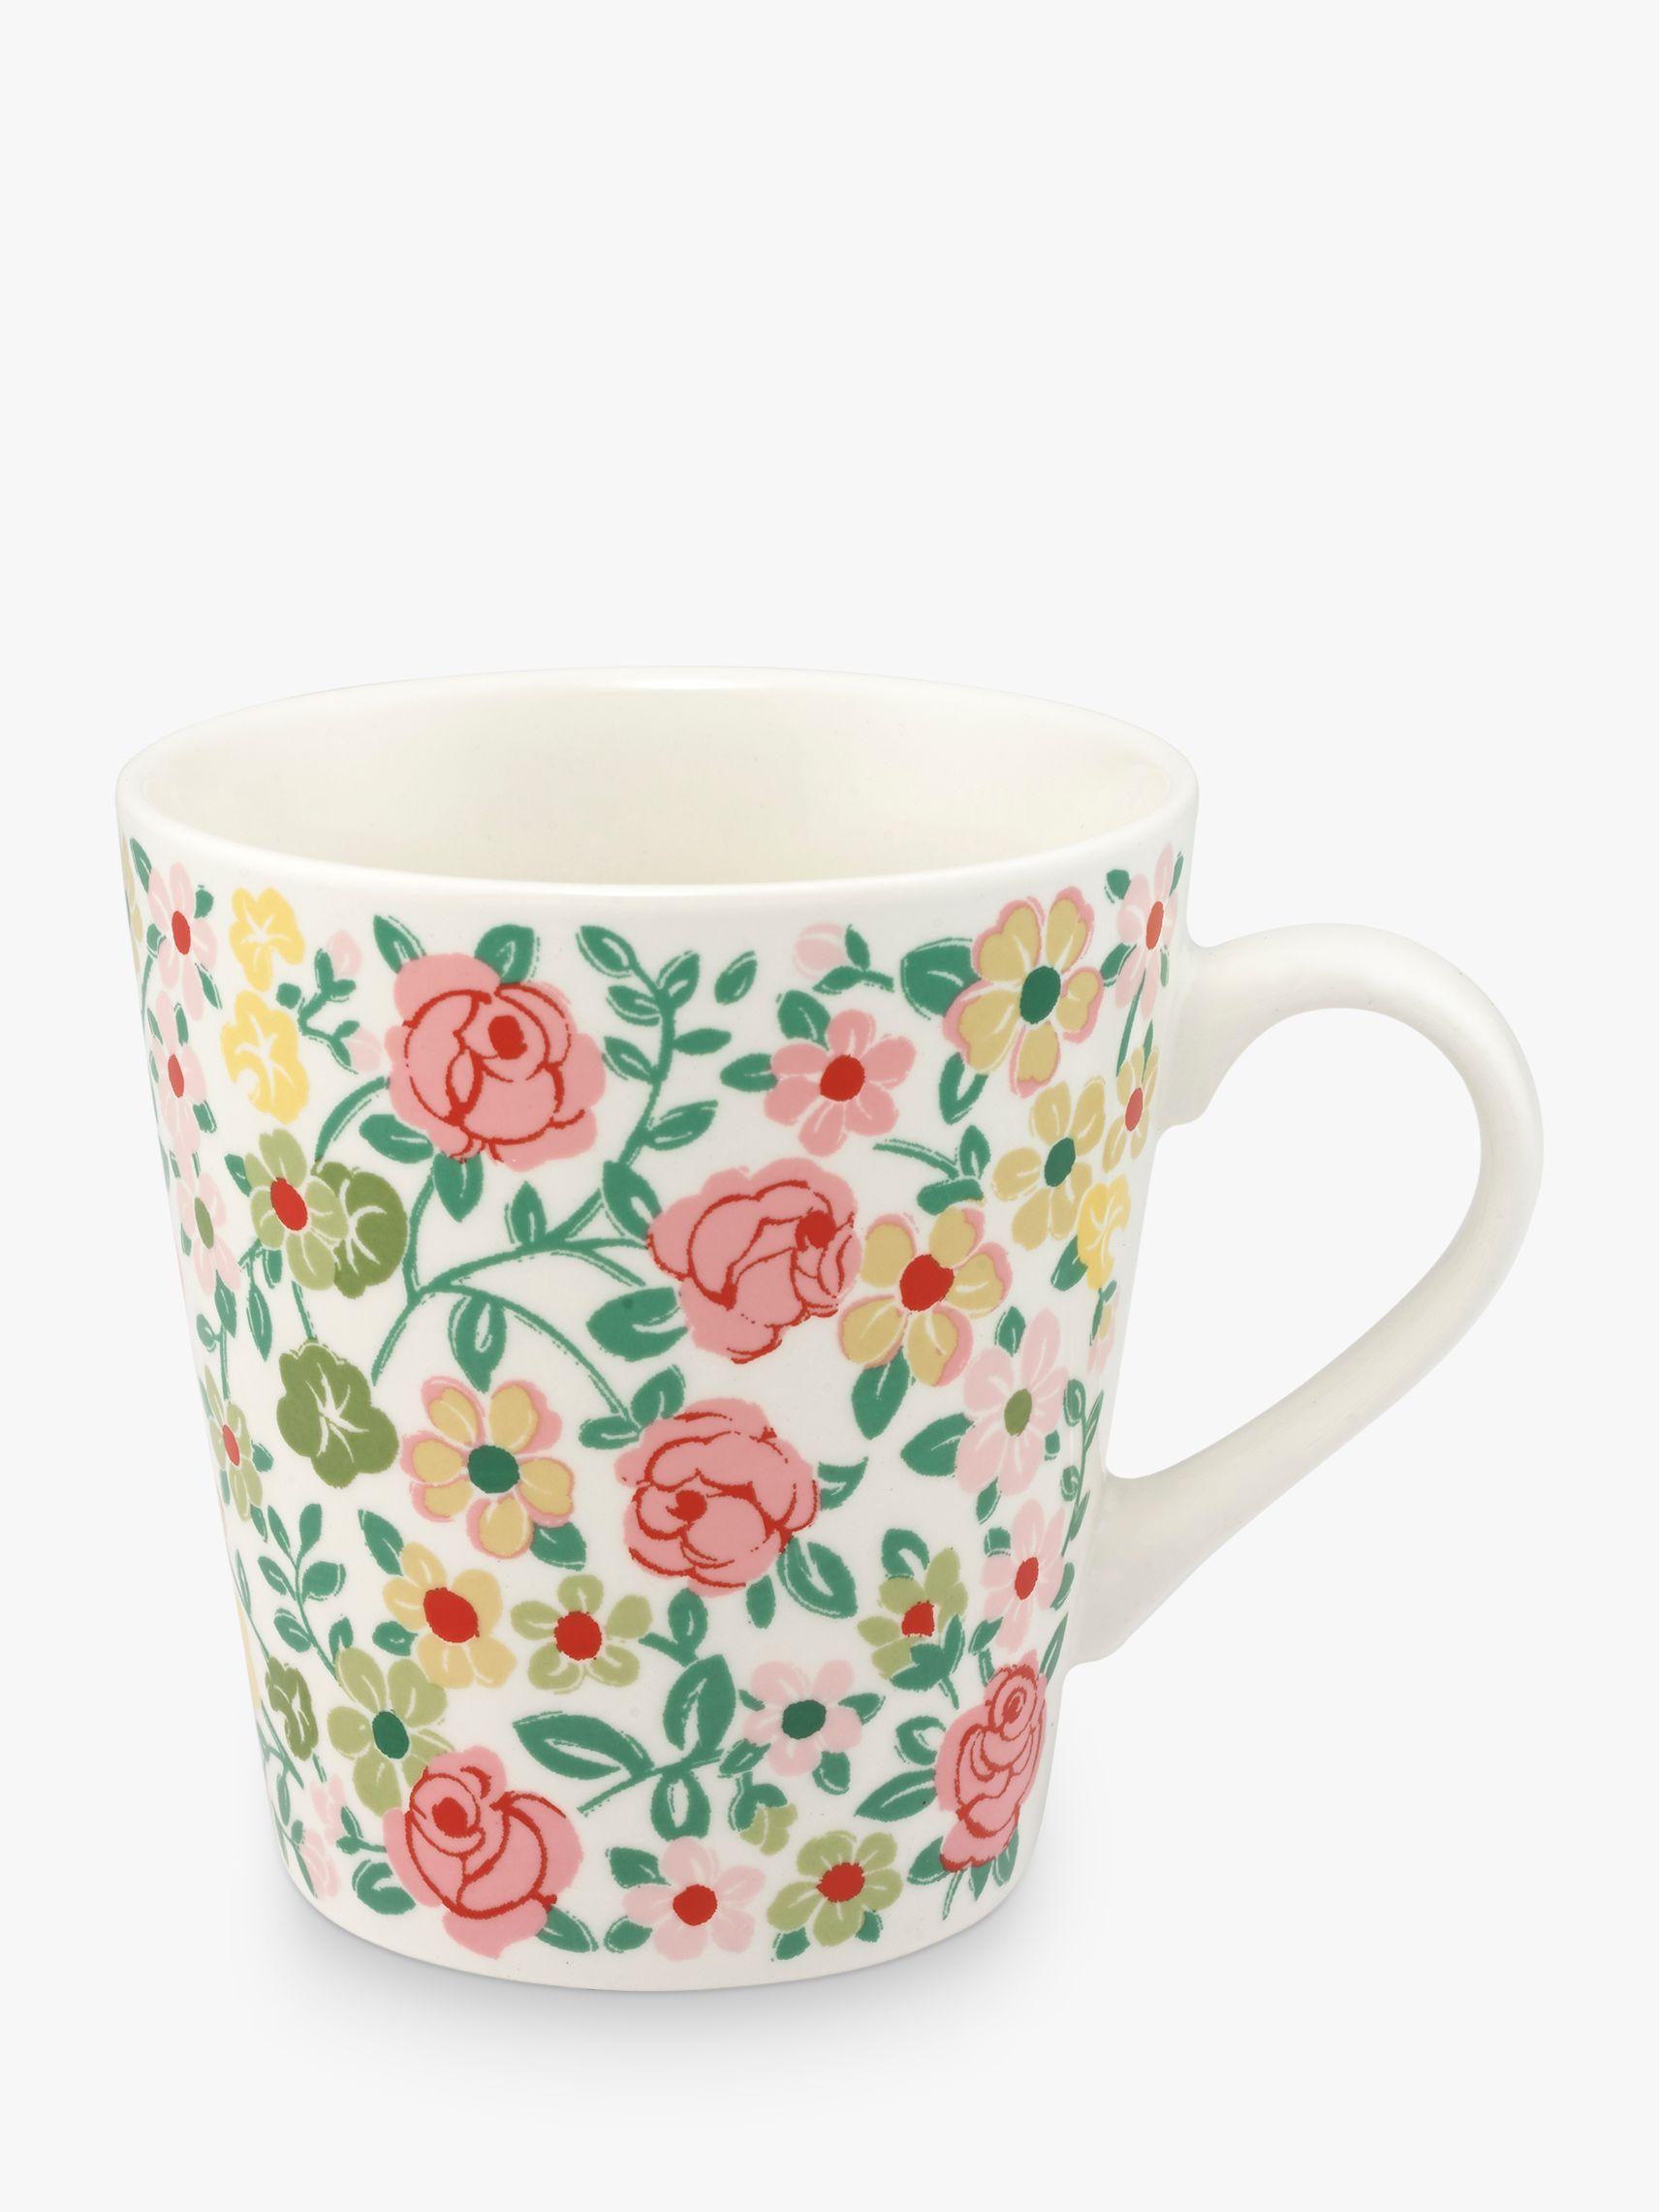 Cath Kidston Cath Kidston Hedge Rose Mini Stanley Mug, 300ml, Multi